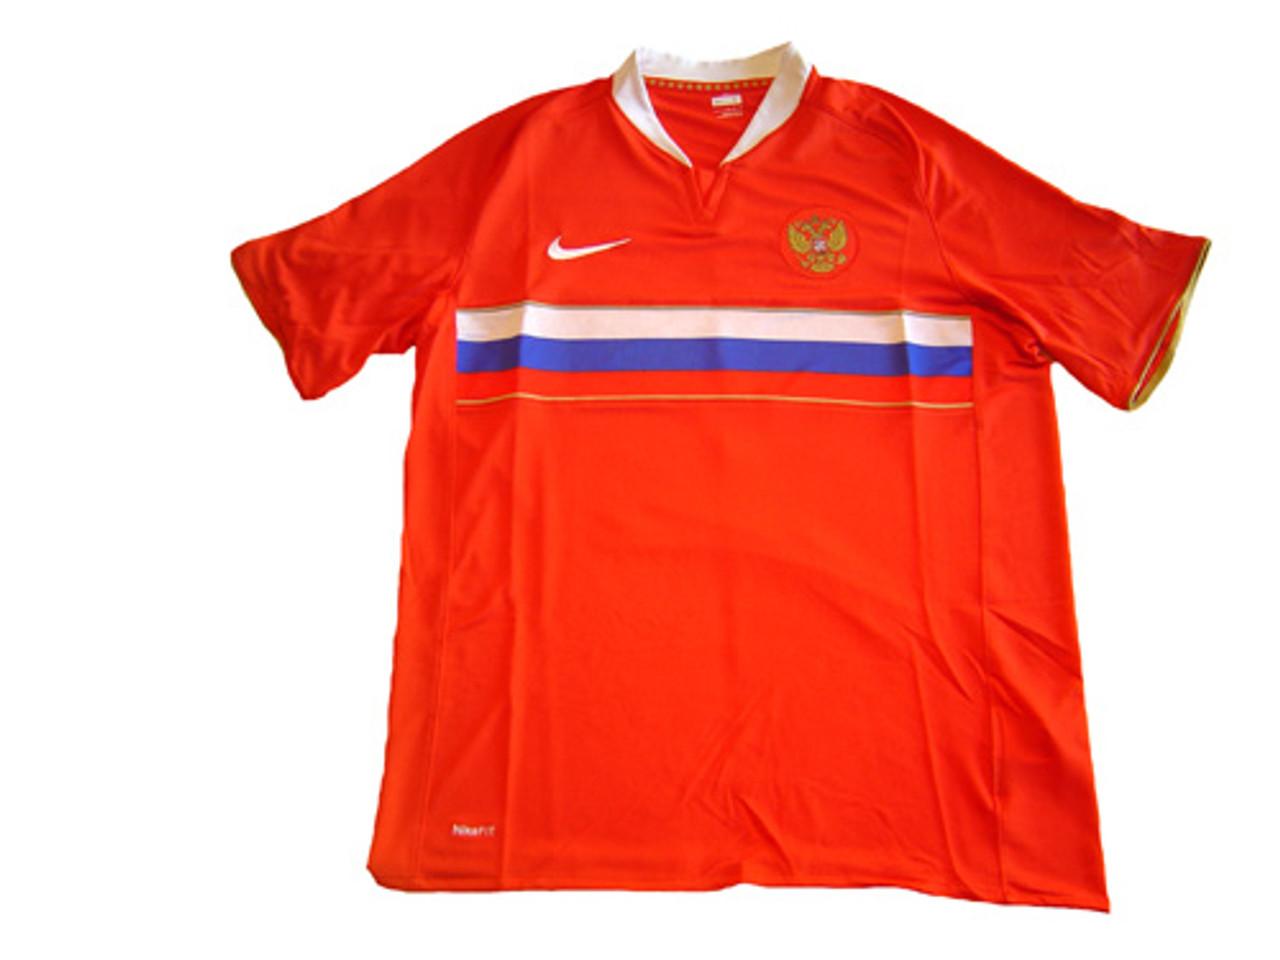 1506fa08e NIKE RUSSIA 2008 AWAY JERSEY RED - Soccer Plus